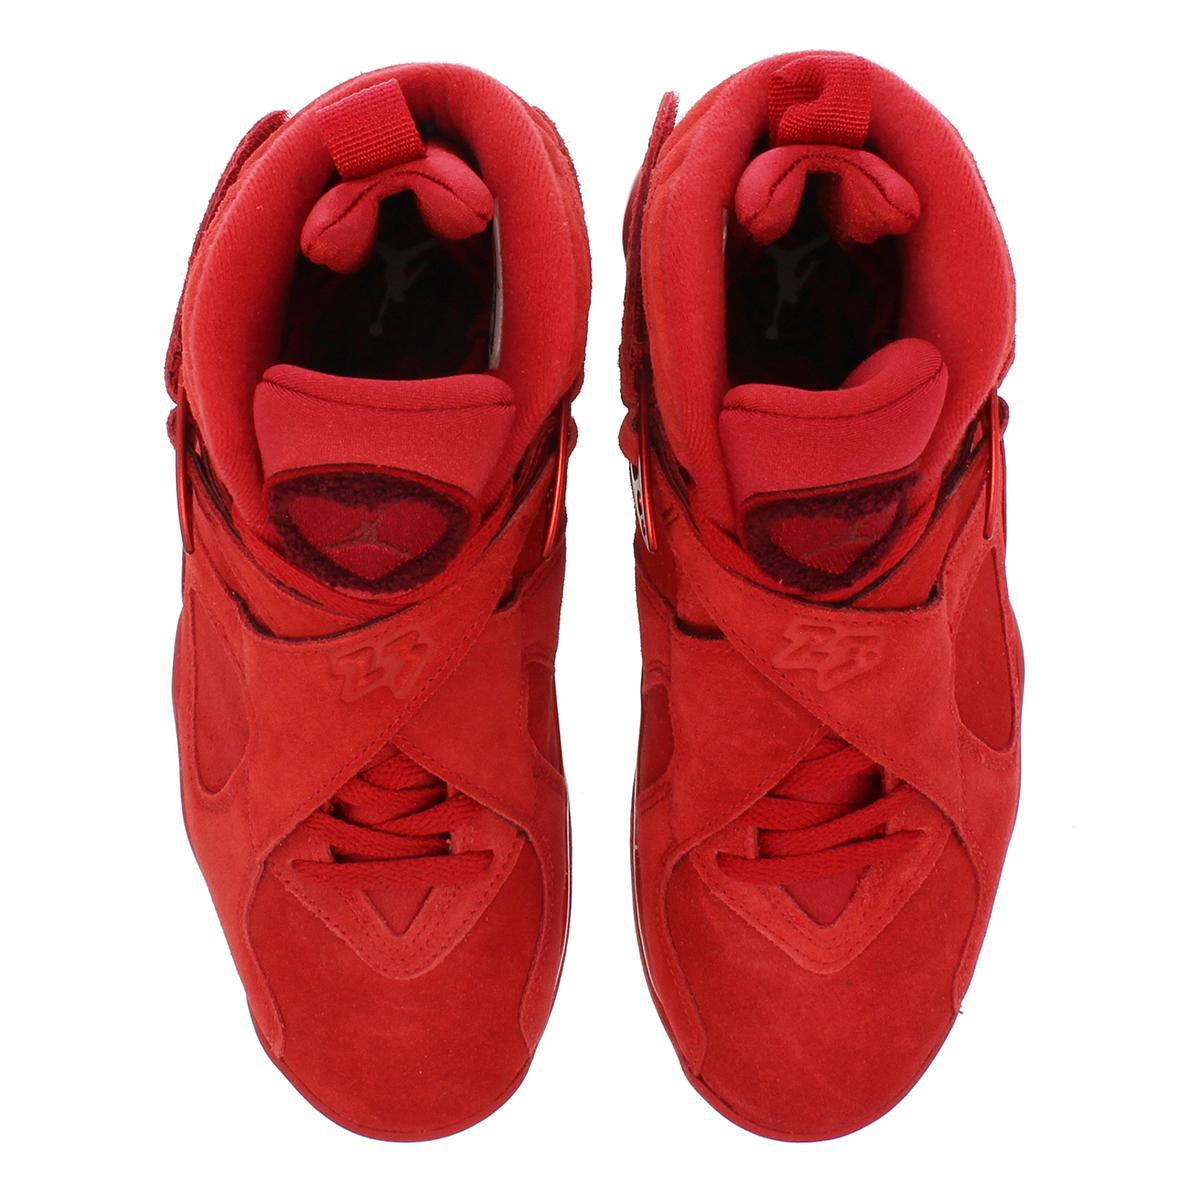 6fb47ba91898 NIKE WMNS AIR JORDAN 8 RETRO VDAY Nike women Air Jordan 8 nostalgic GYM  RED EMBER GLOW TEAM RED aq2449-614-l